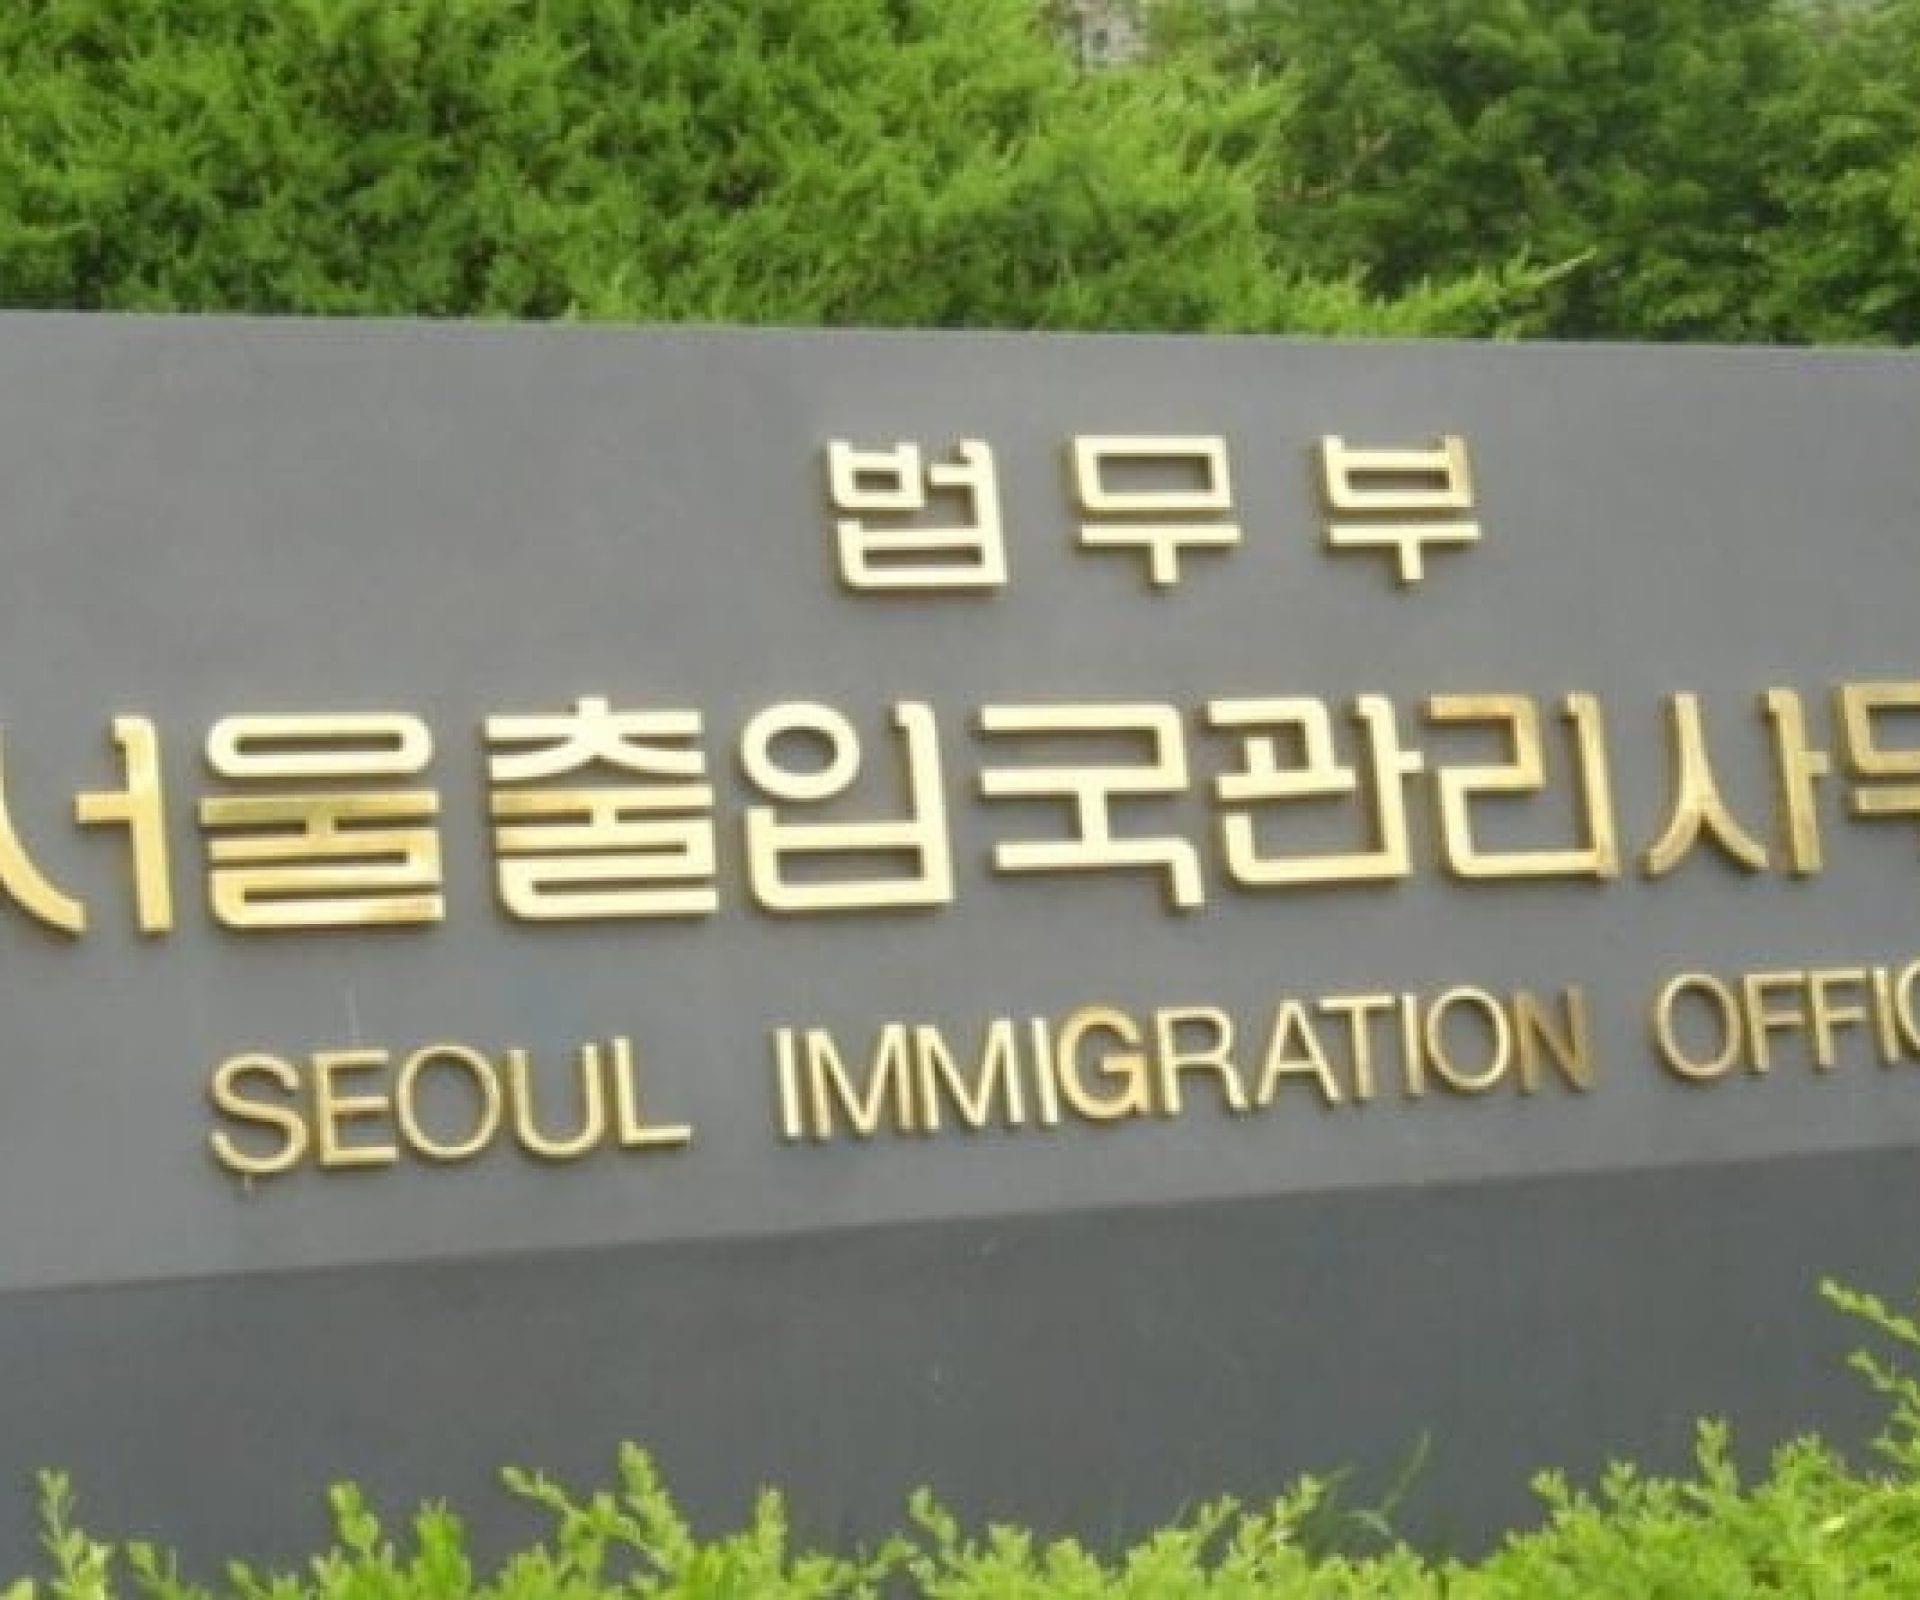 Seoul Immigration Office | Yangcheon-gu, Seoul